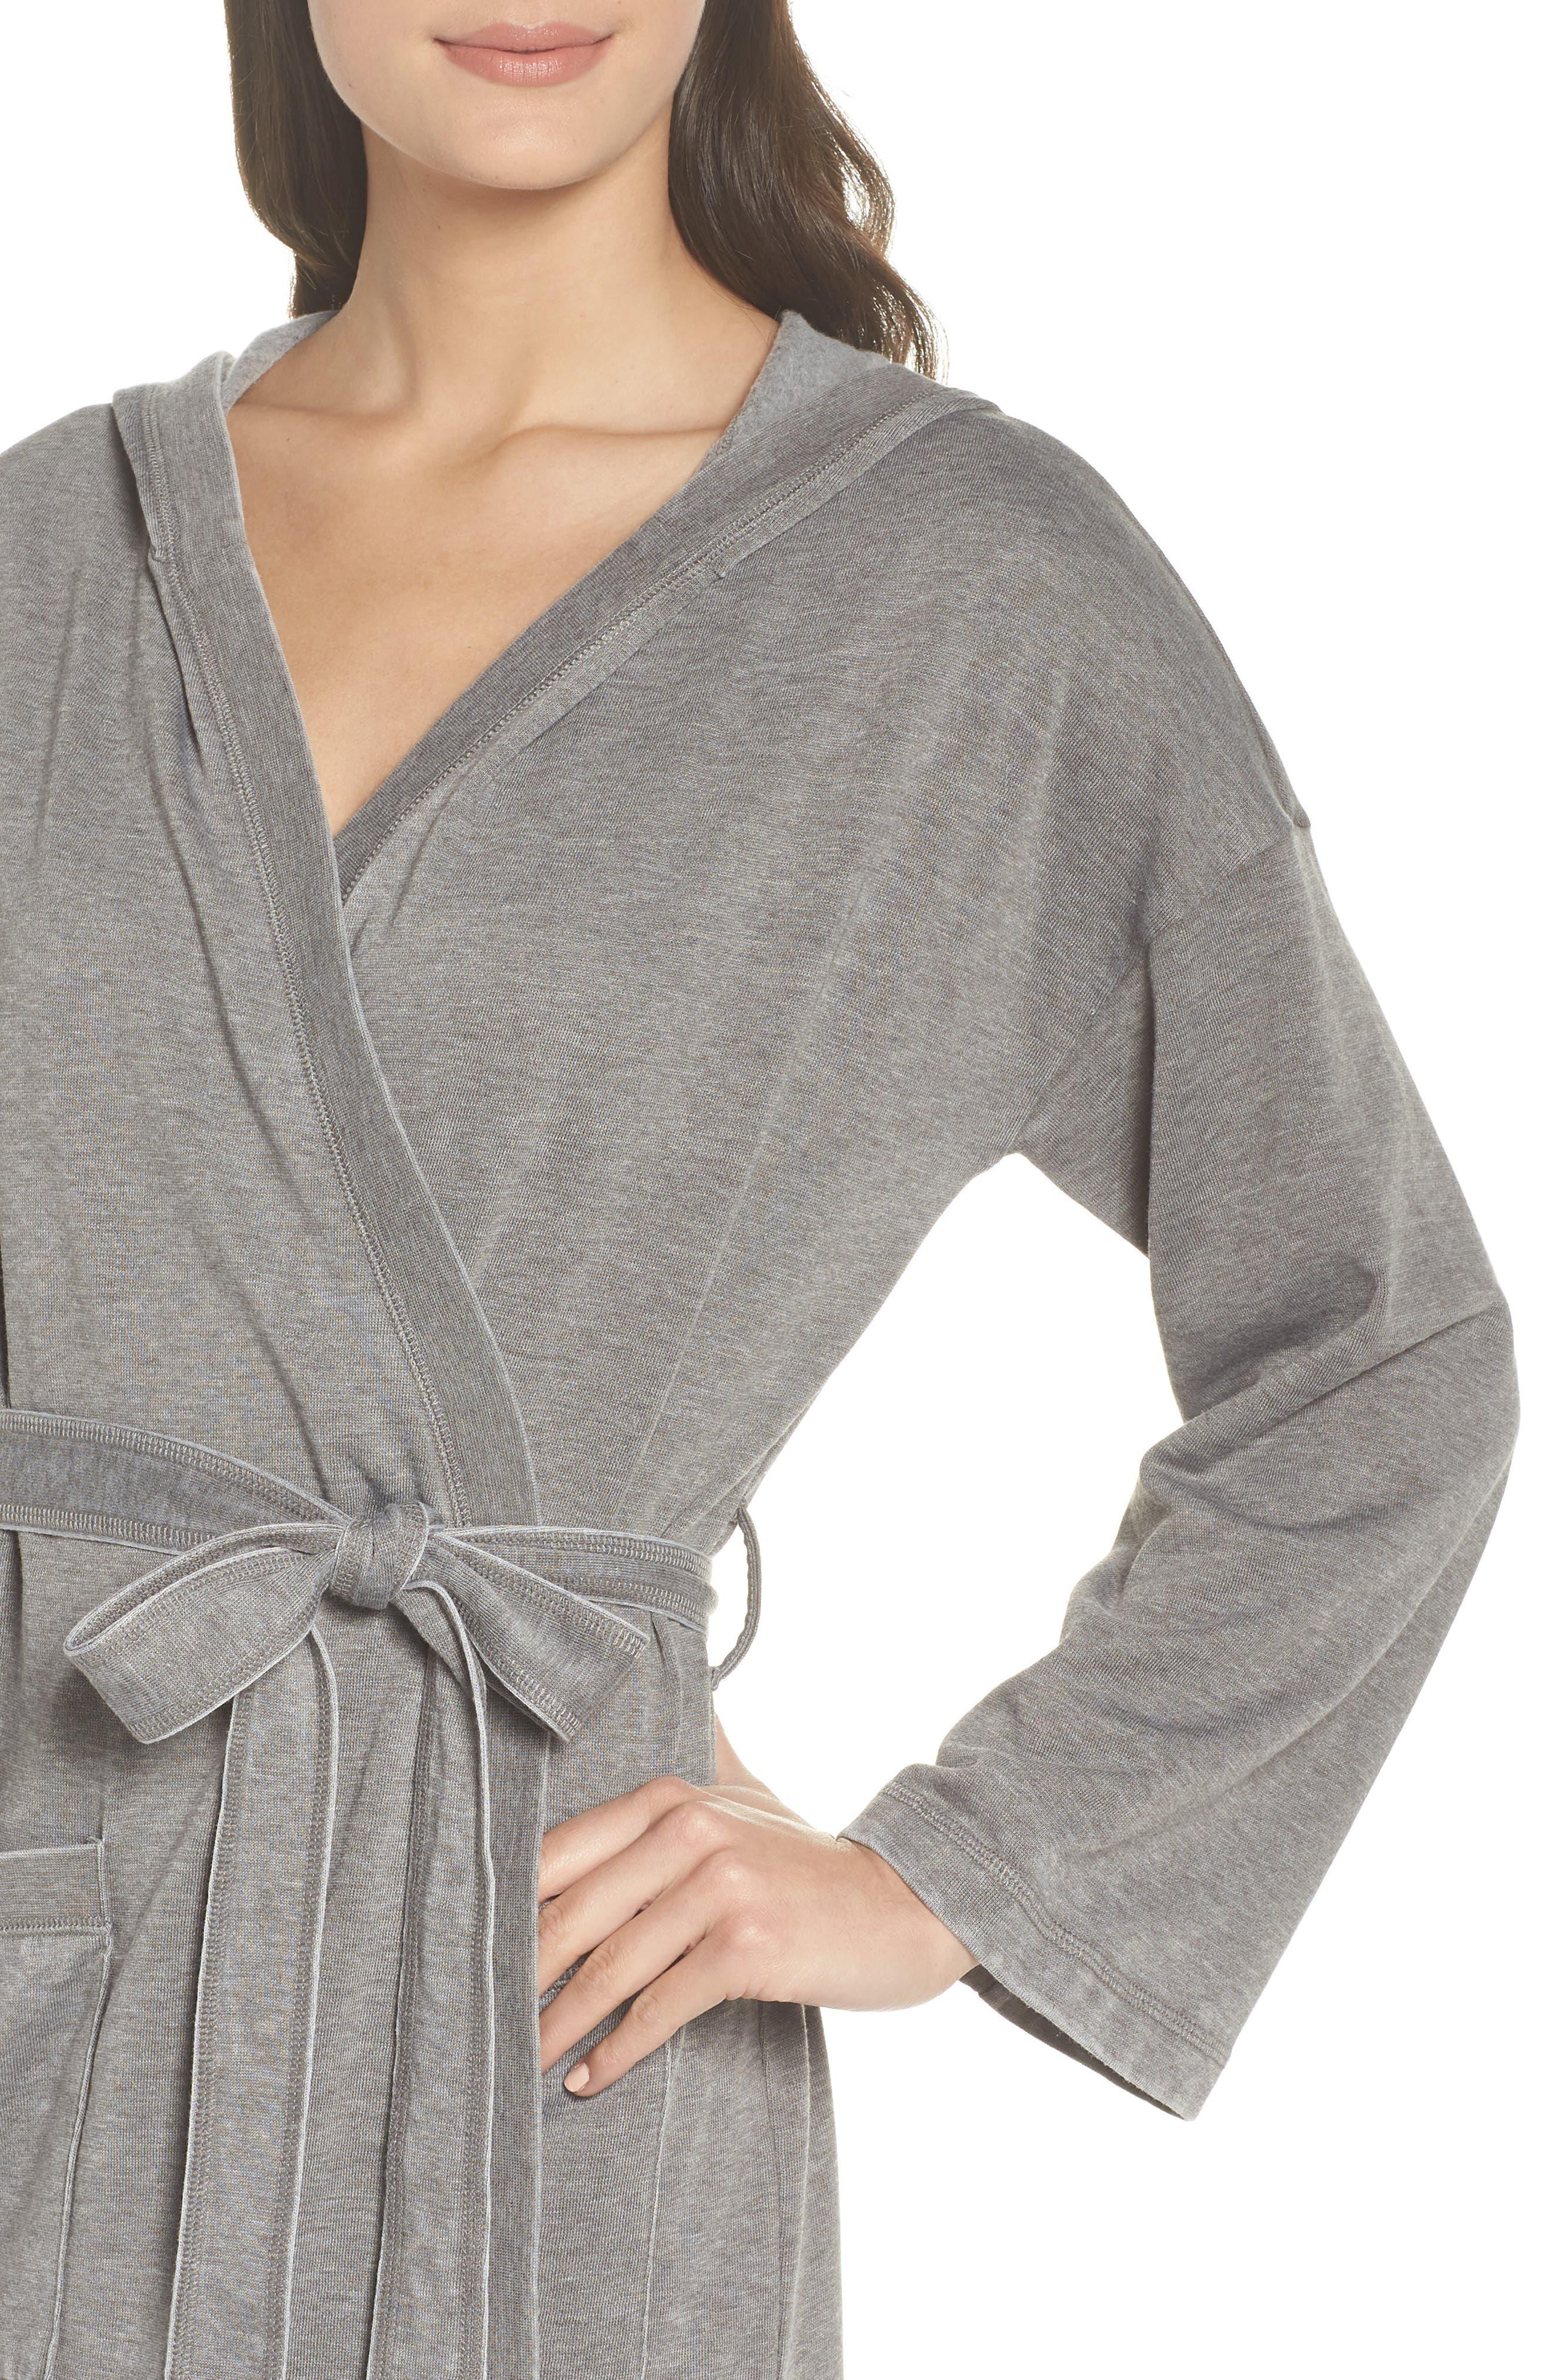 Sweatshirt Robe,                             Alternate thumbnail 4, color,                             GREY CASTLEROCK